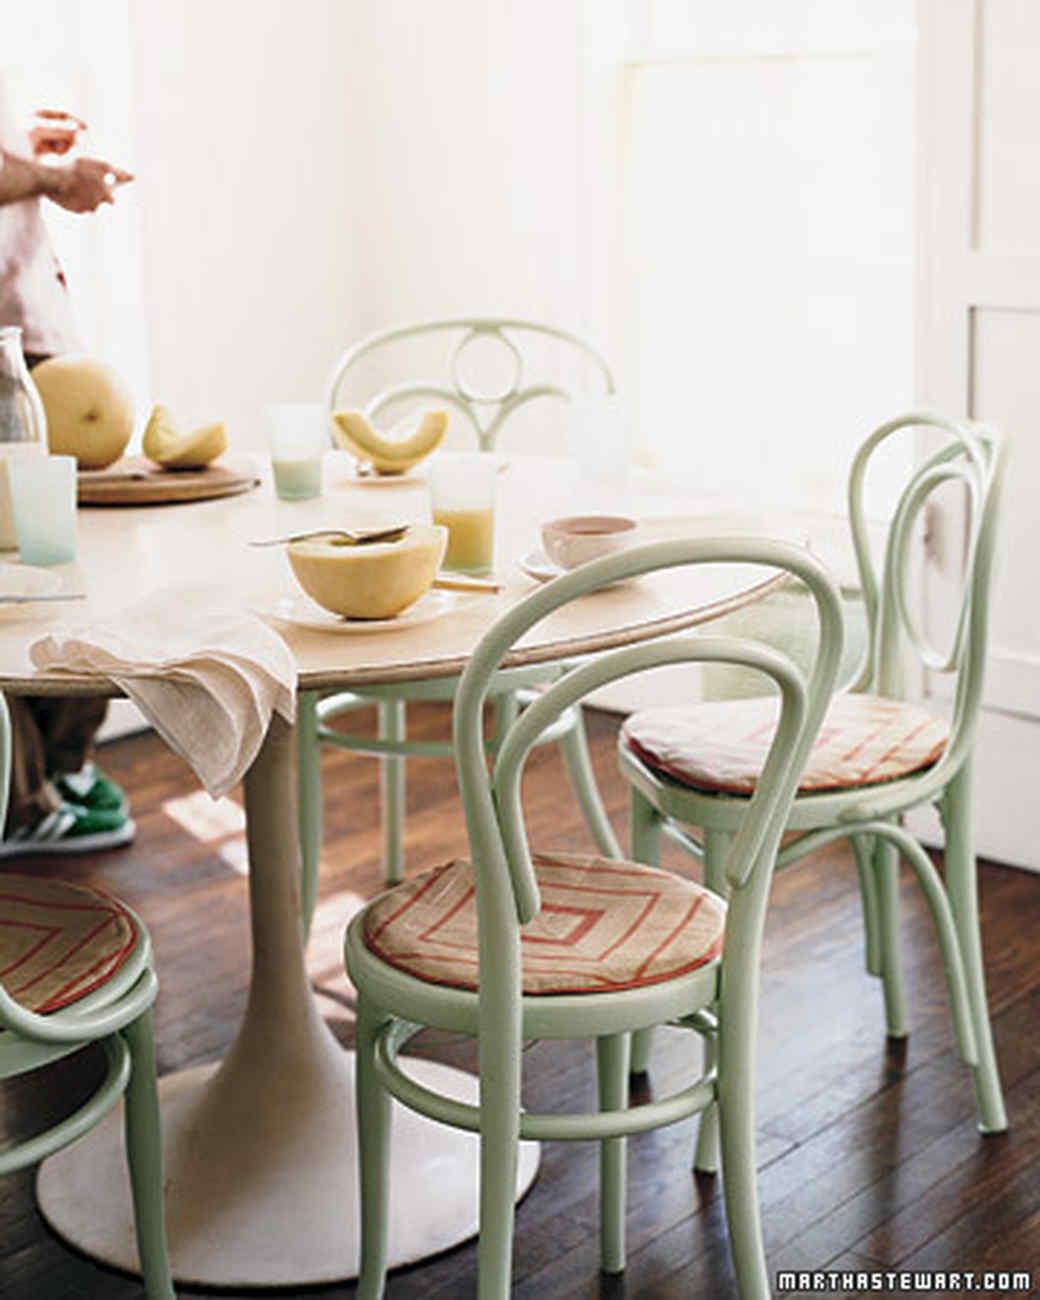 mla103135_0807_tablechairs.jpg